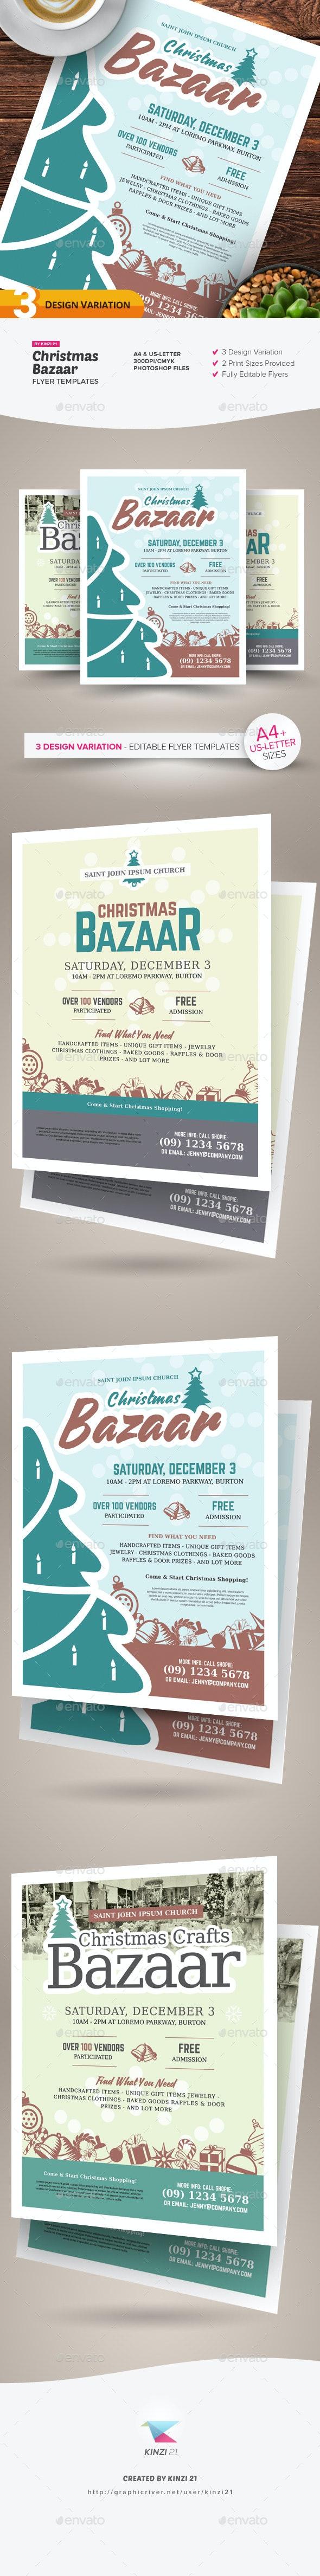 Christmas Bazaar Flyer Templates - Holidays Events